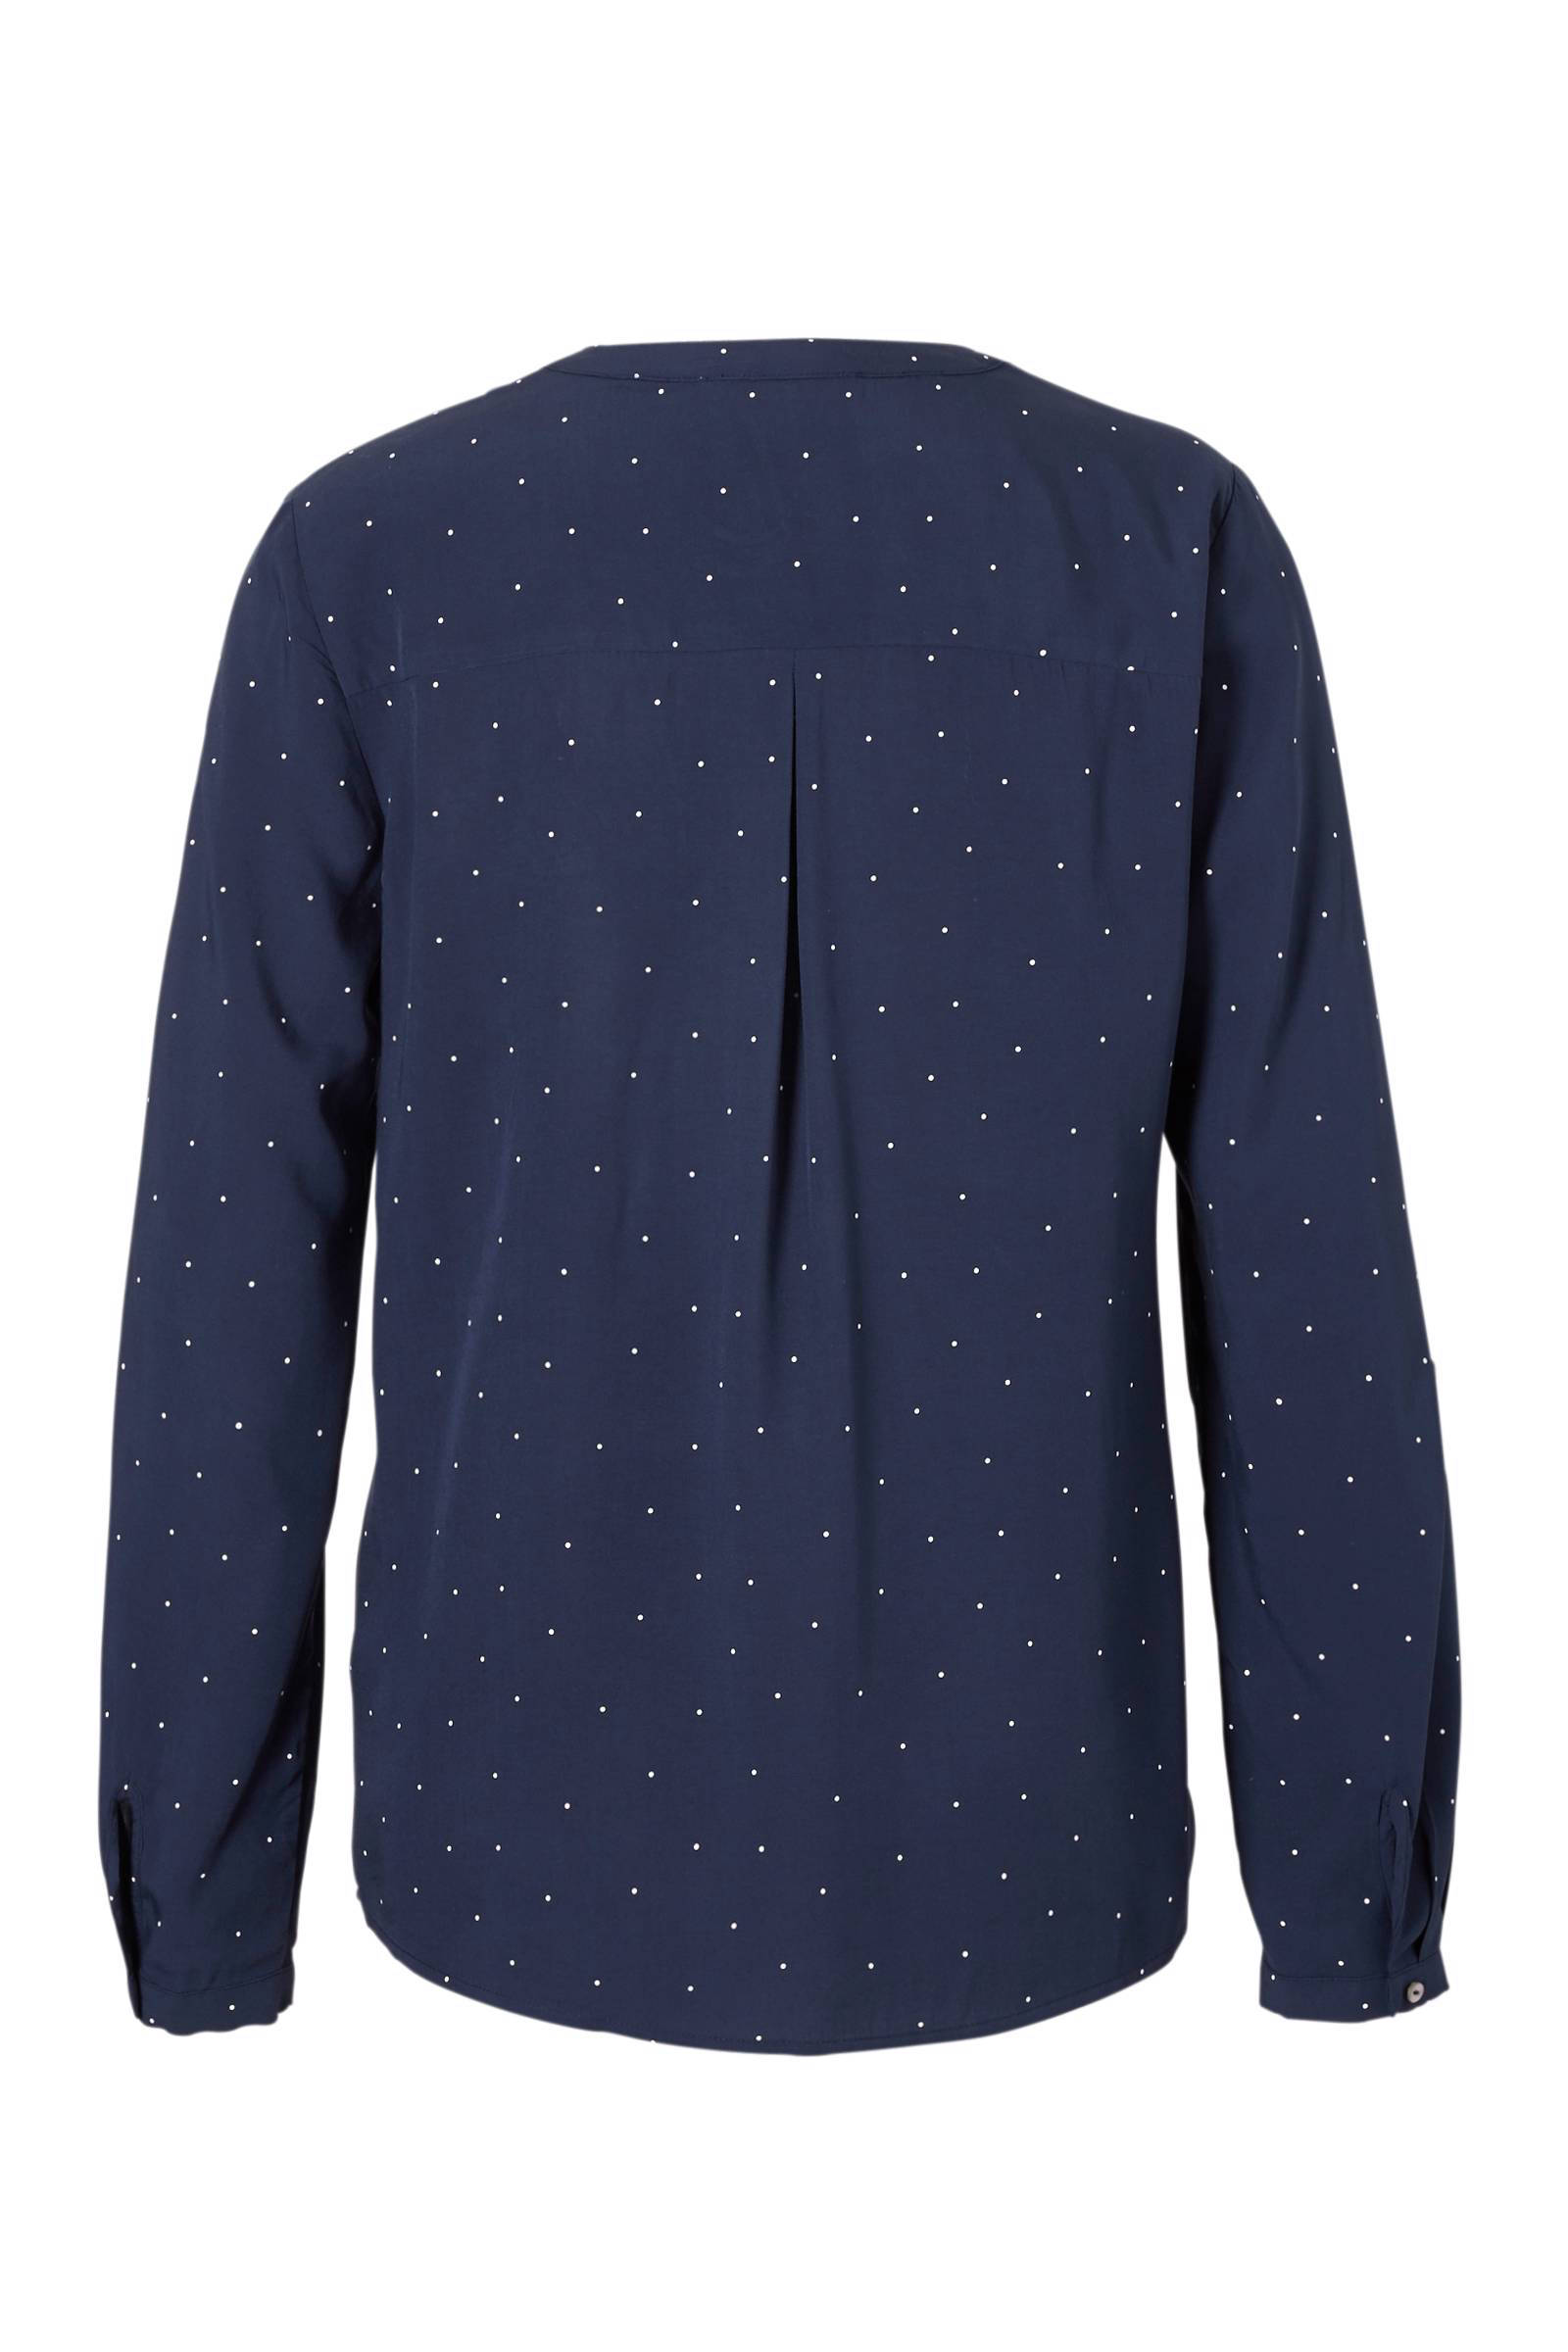 stippen Casual ESPRIT met blouse Women qCnZT